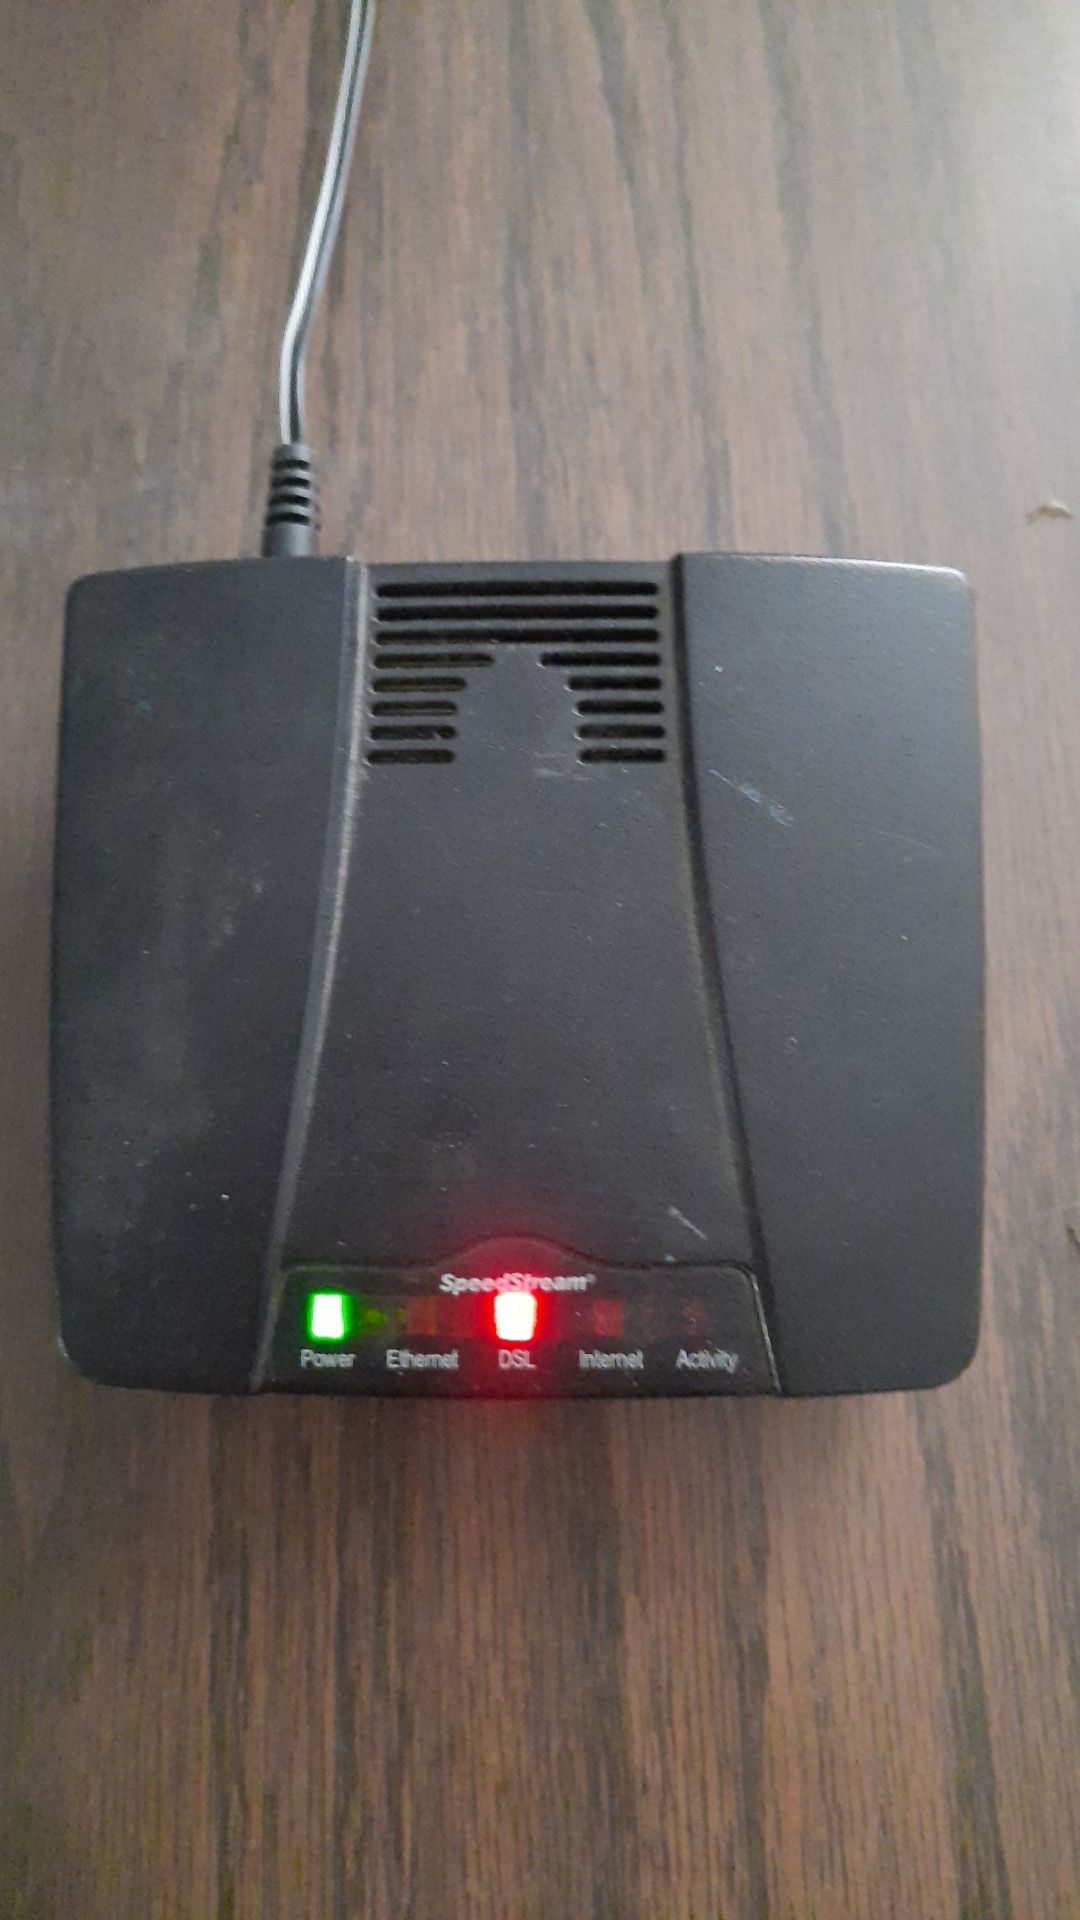 SIEMENS SpeedStream 4100 Ethernet DSL Modem